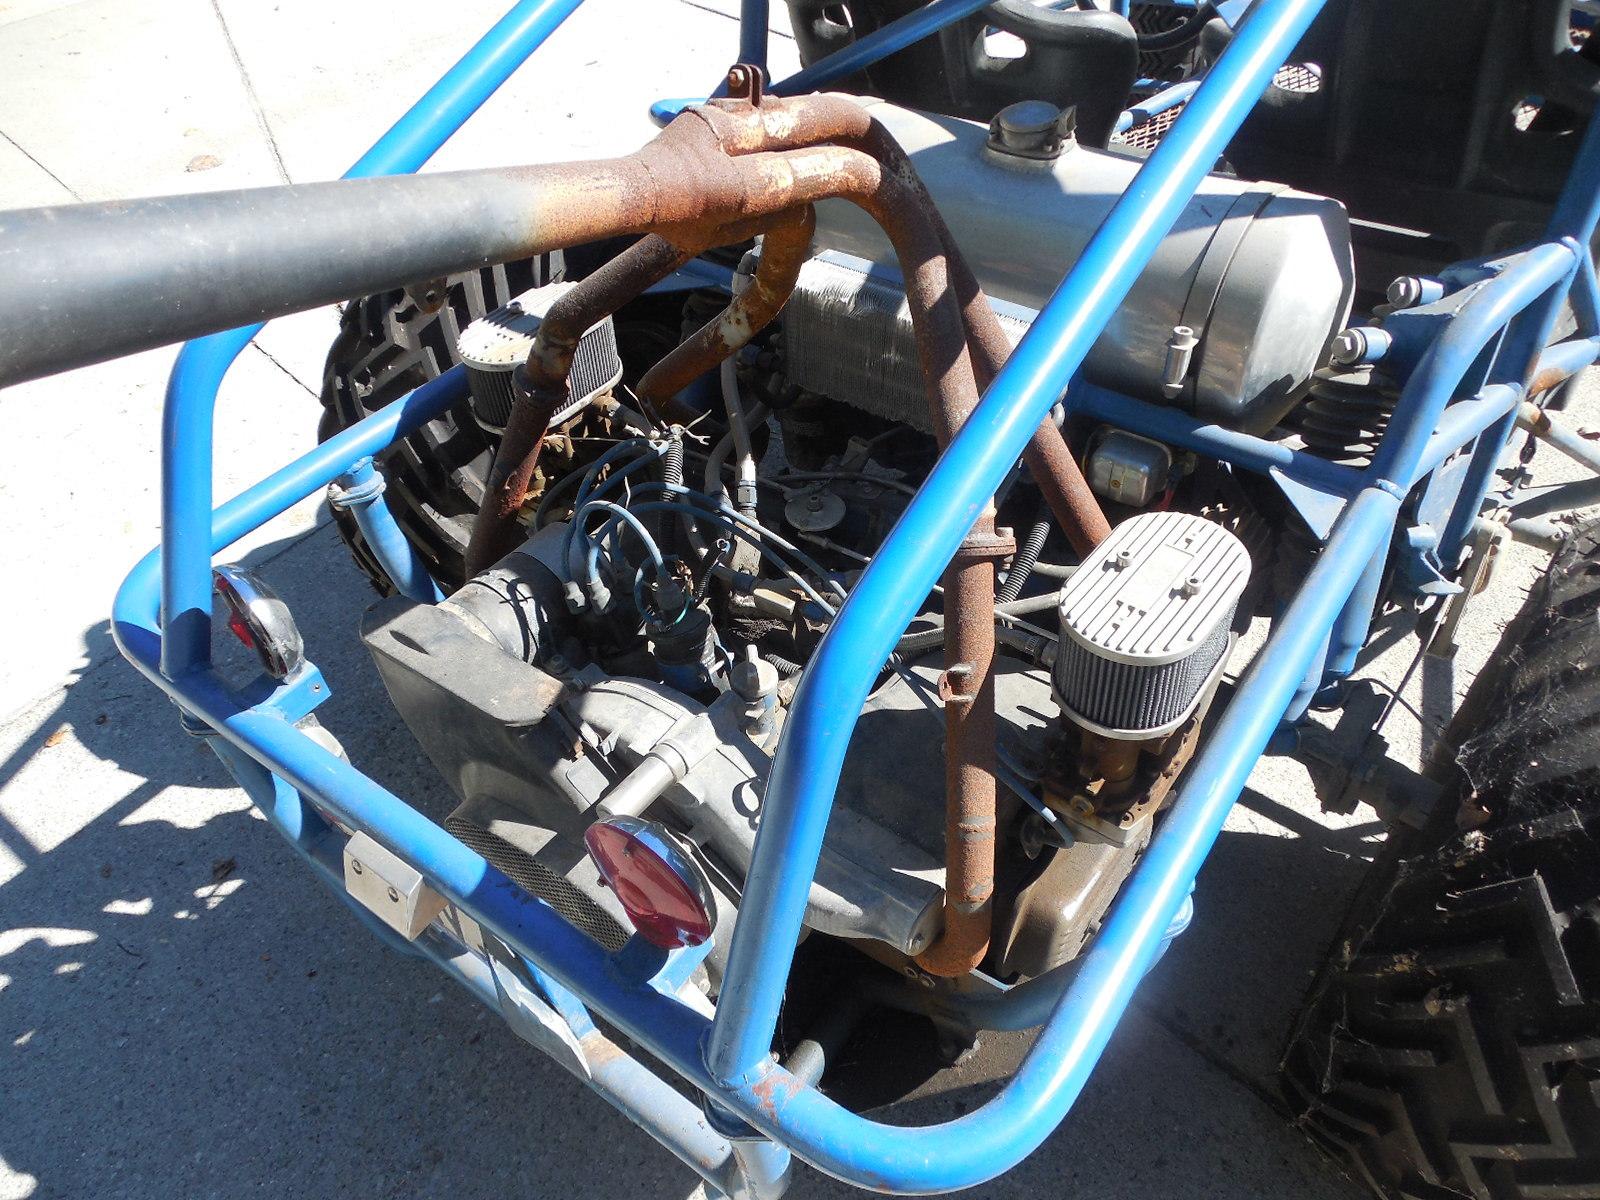 Vw Sand Rail Dune Buggy 1974 New Tires Rims Pancake Engine